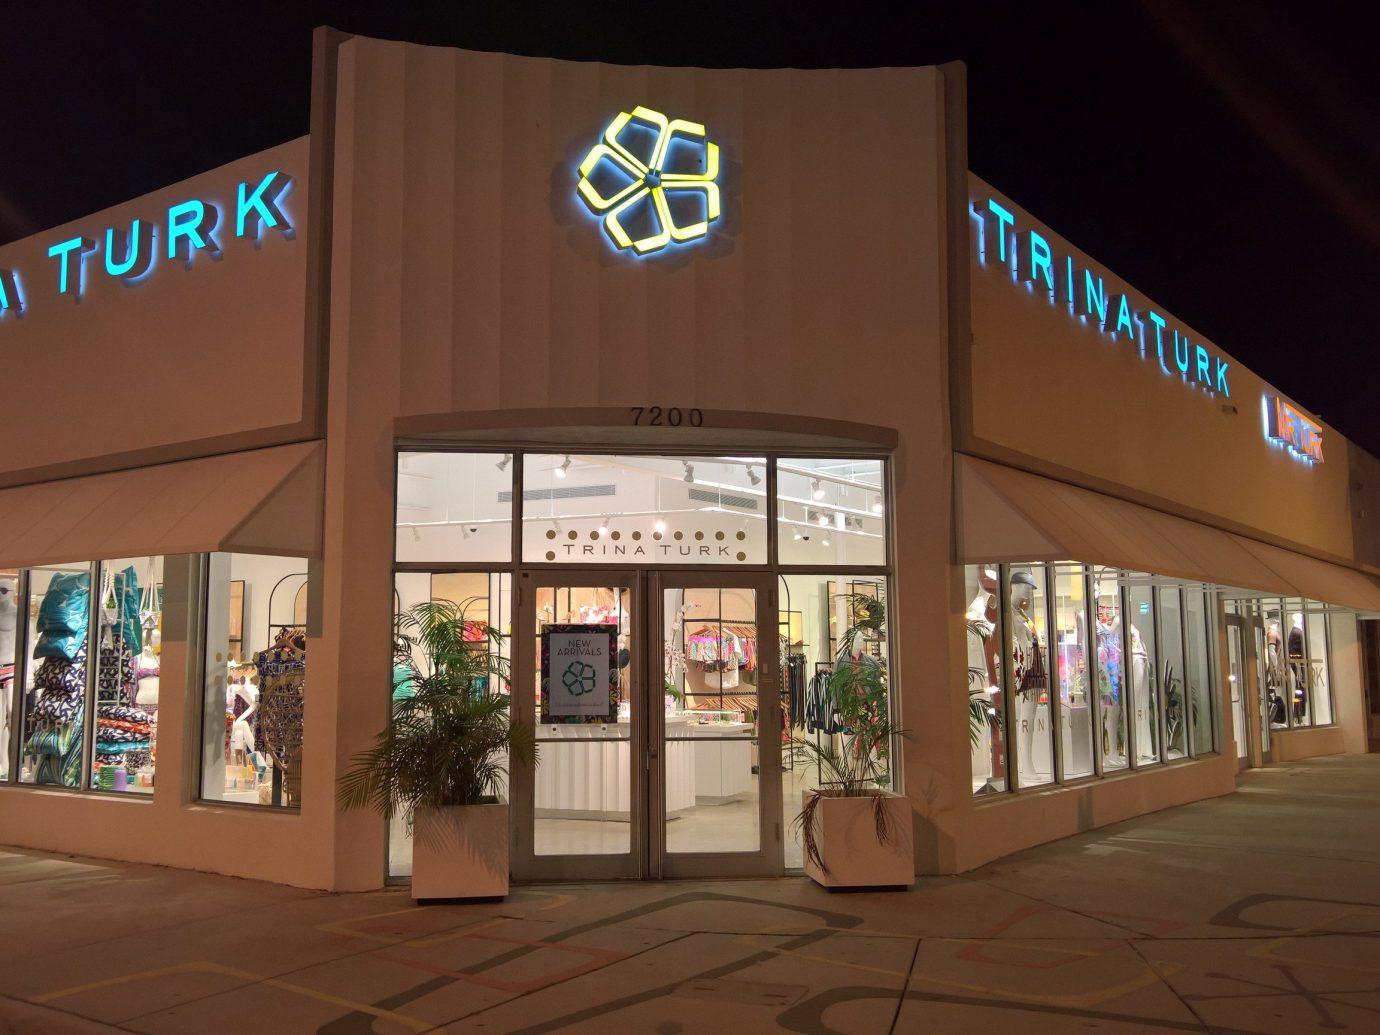 Trip Ideas outdoor night sign scene shopping mall interior design store Shop